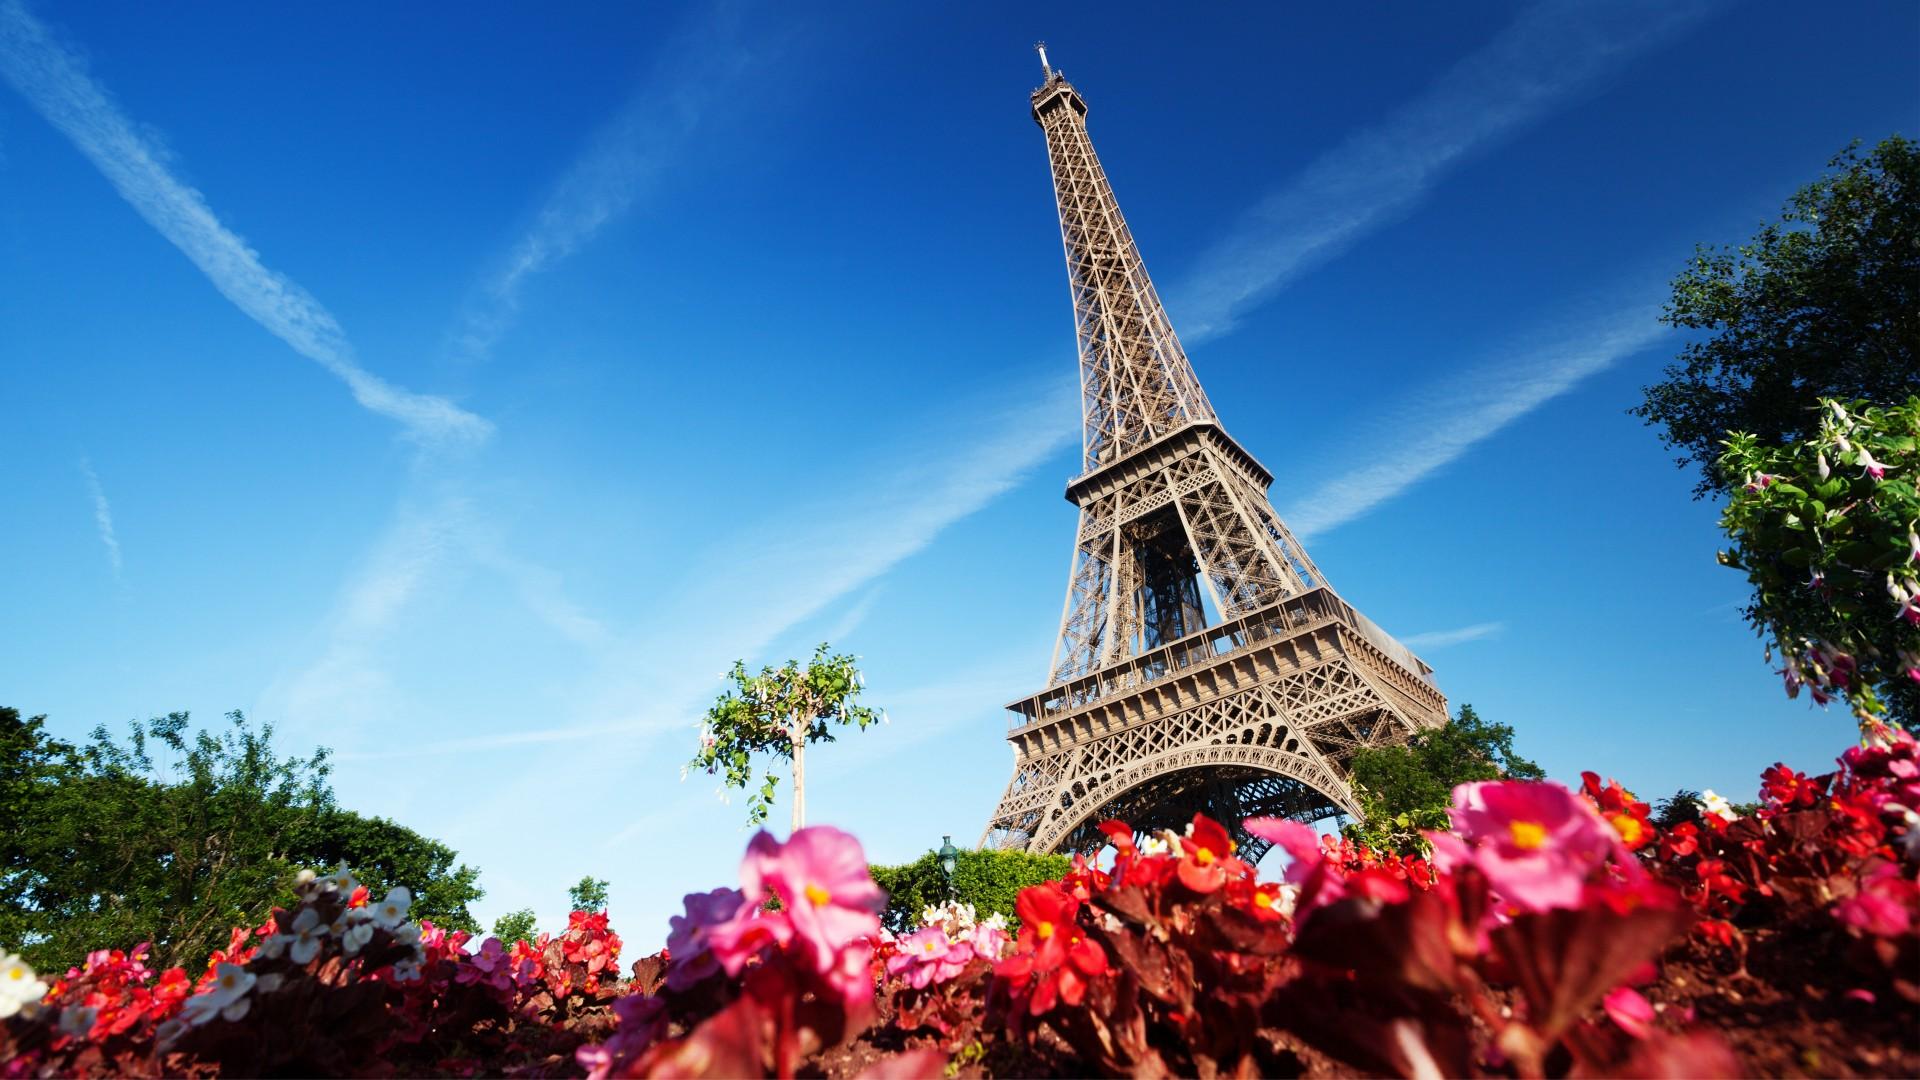 eiffel_tower_paris_france-1920x1080